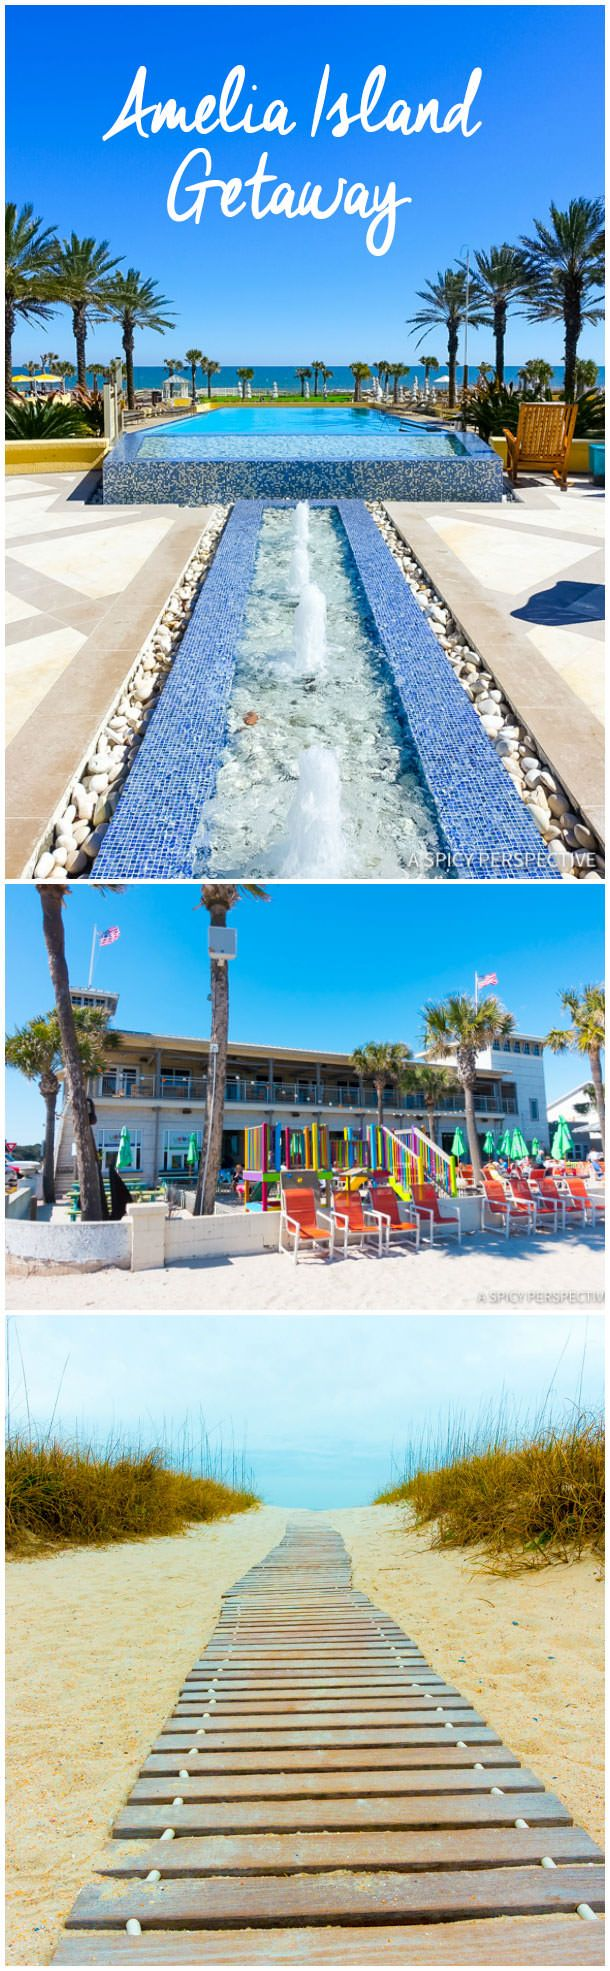 Where to Eat in Amelia Island, Florida - Travel Planning Tips for Amelia Island & Ferandina Beach! | ASpicyPerspective.com